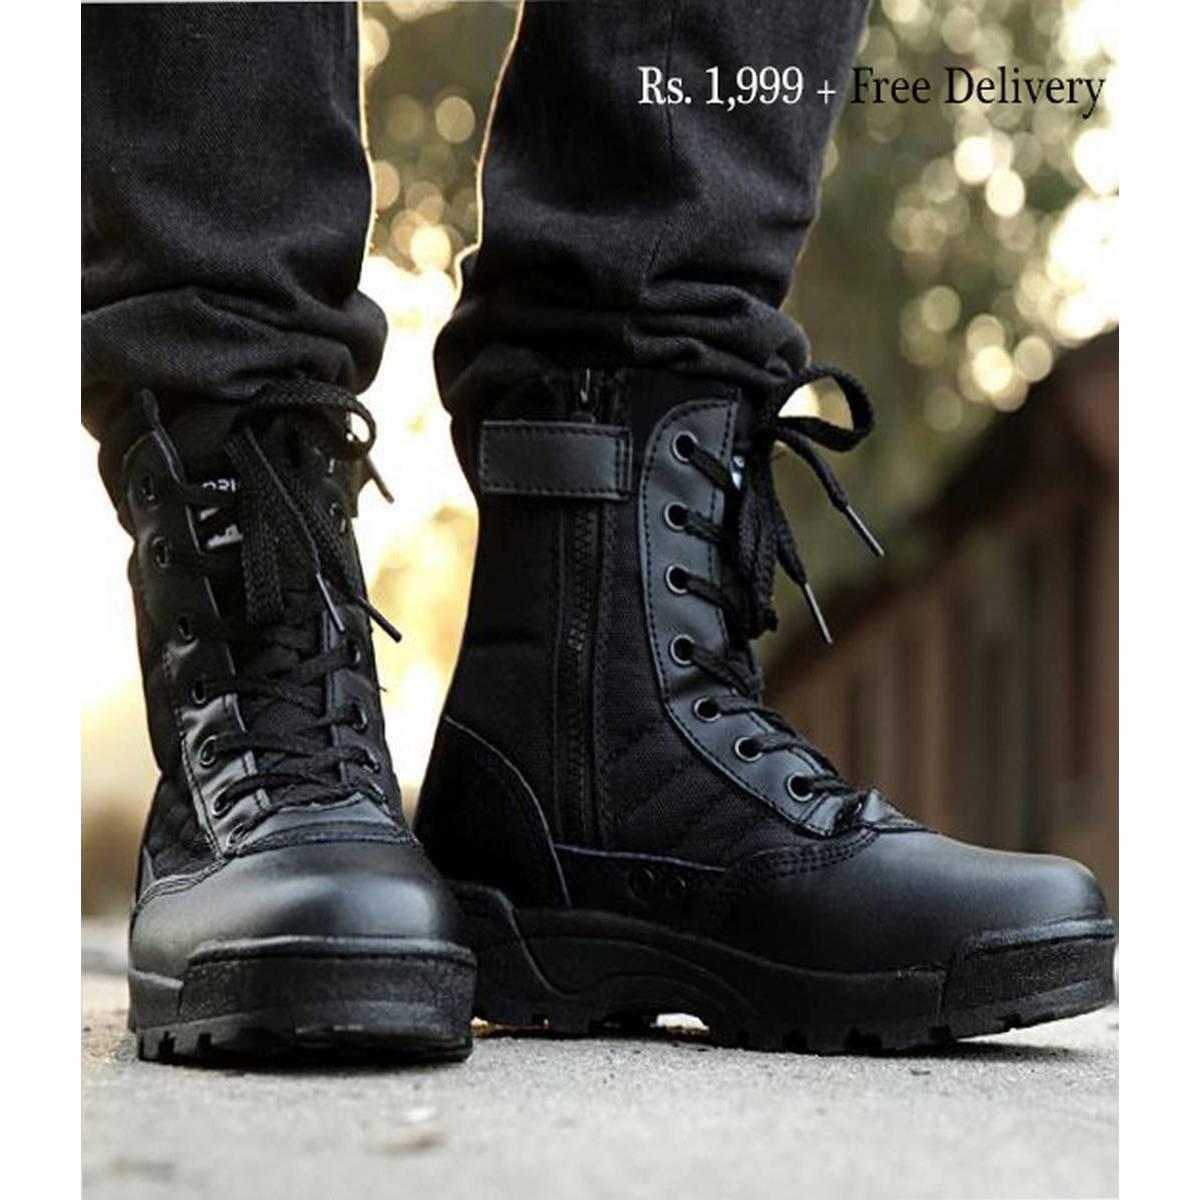 Army Delta Shoes Black Biker Boots